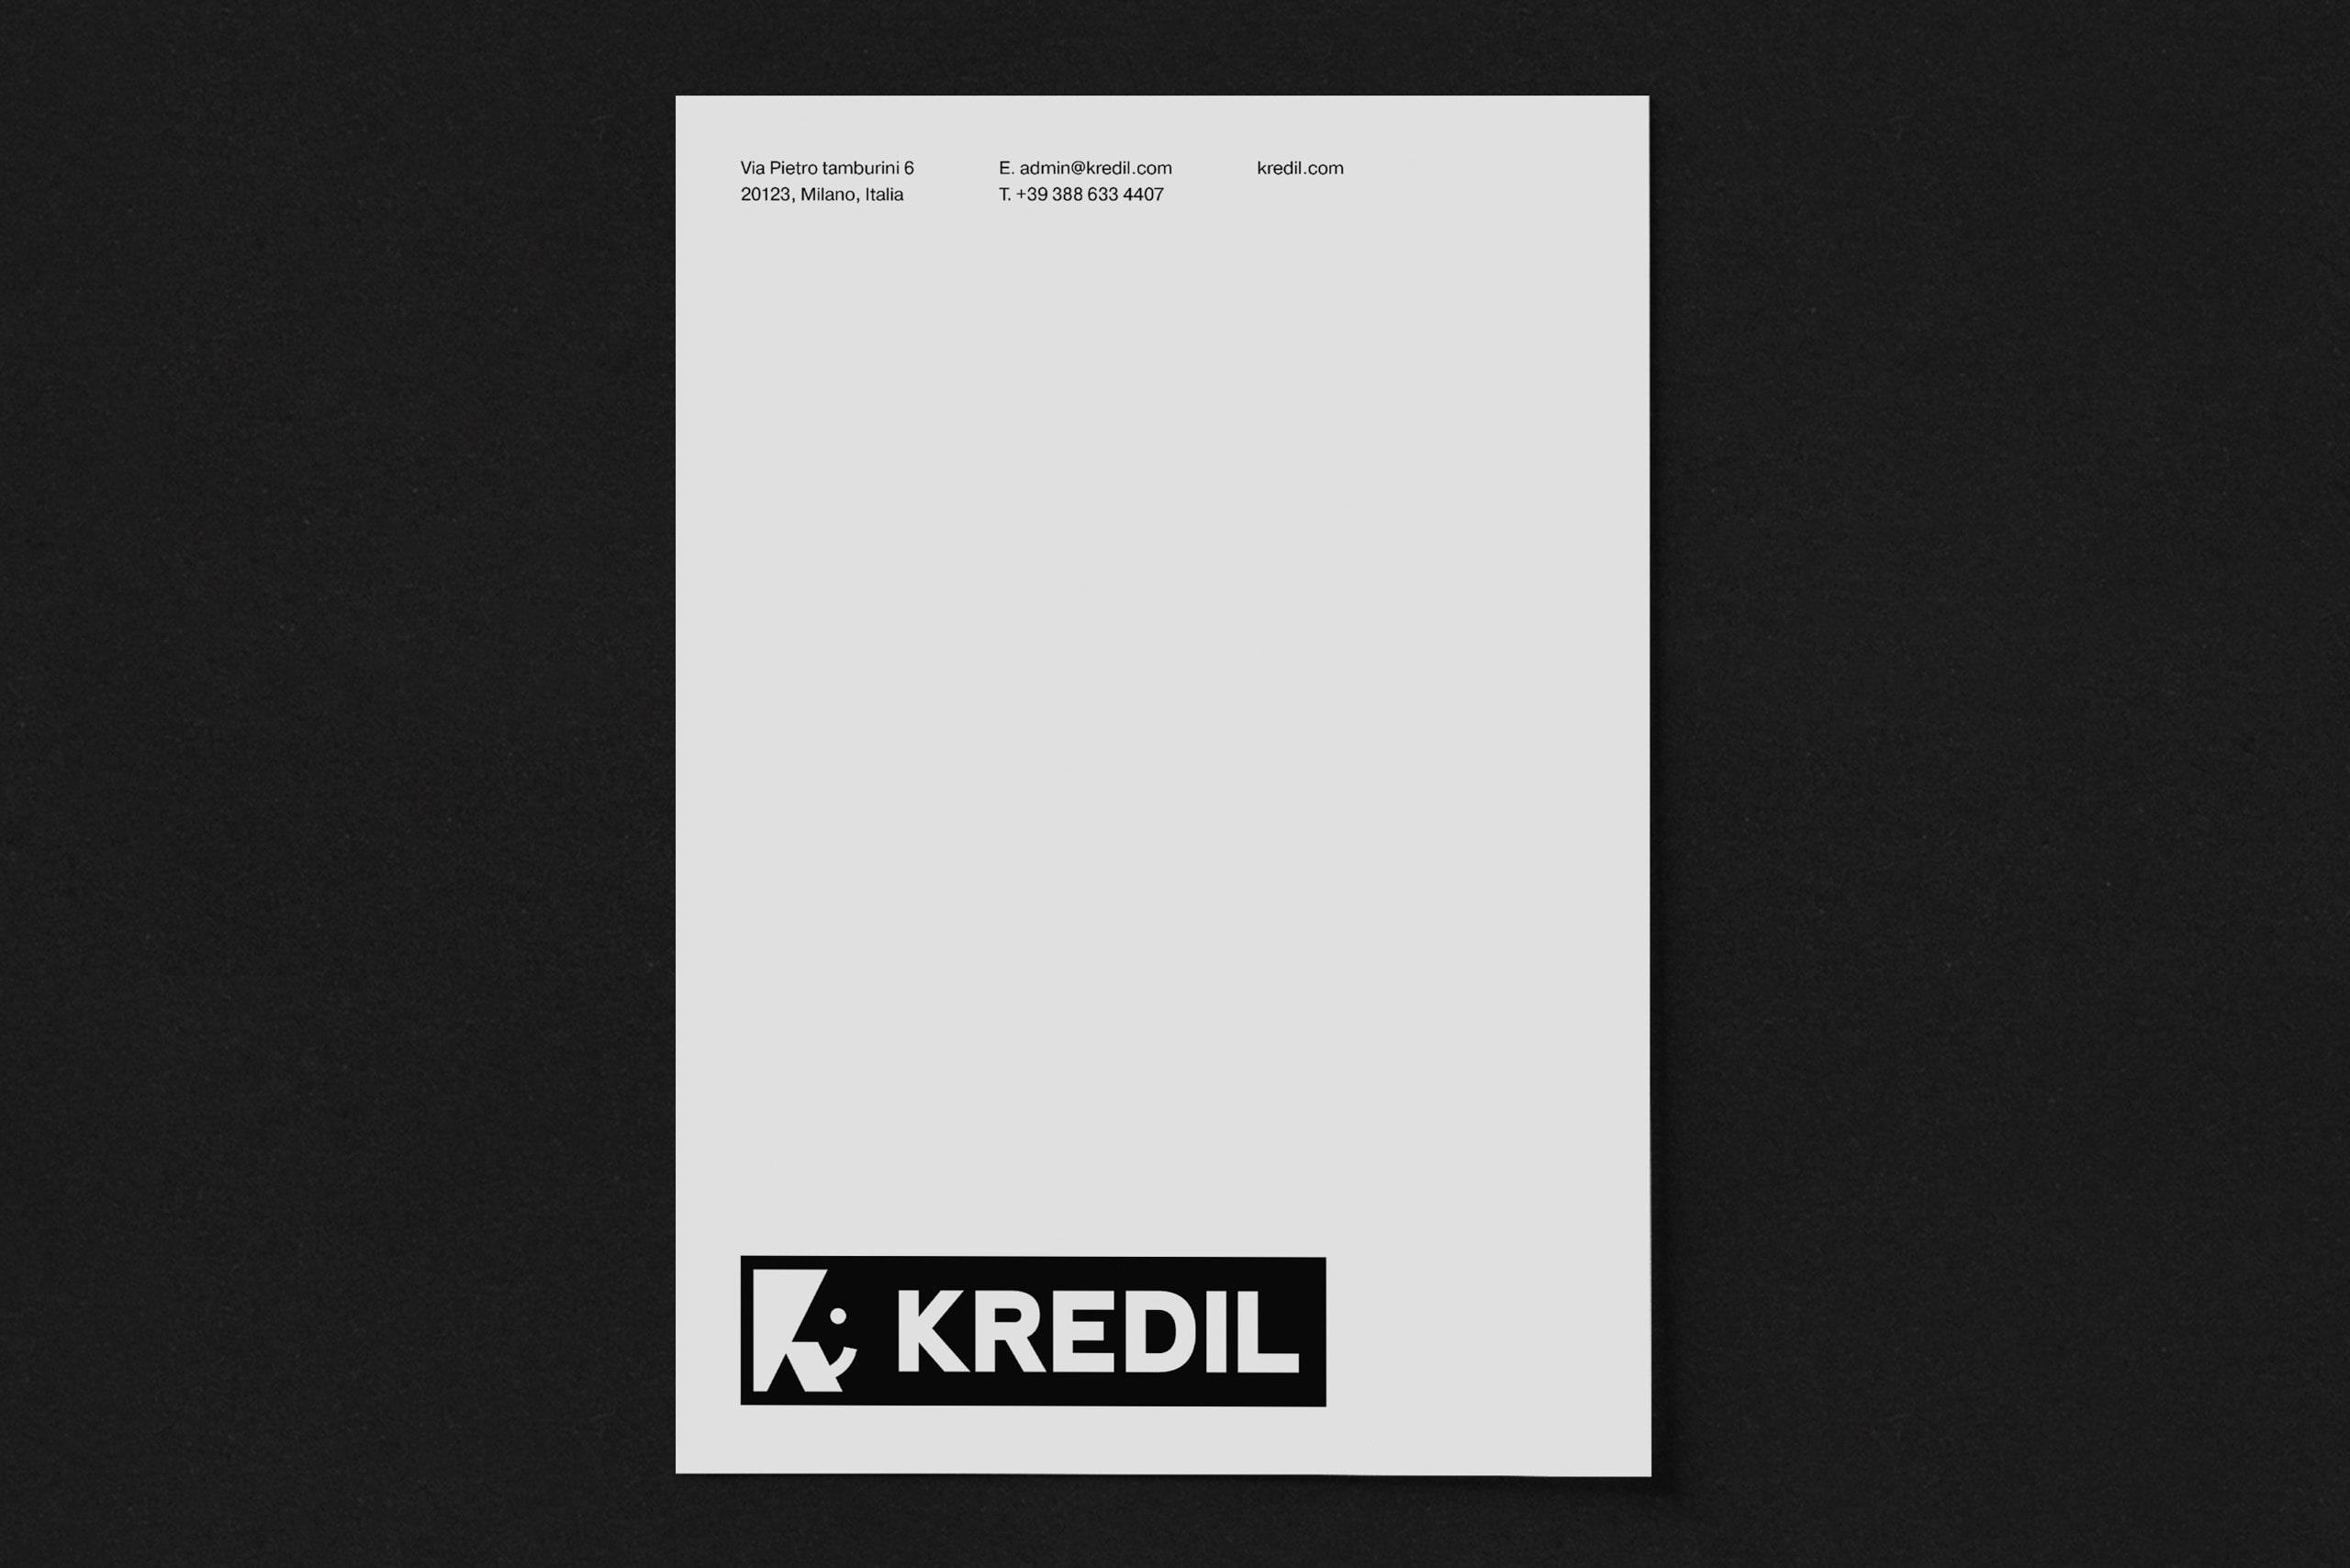 Kredil Letterhead